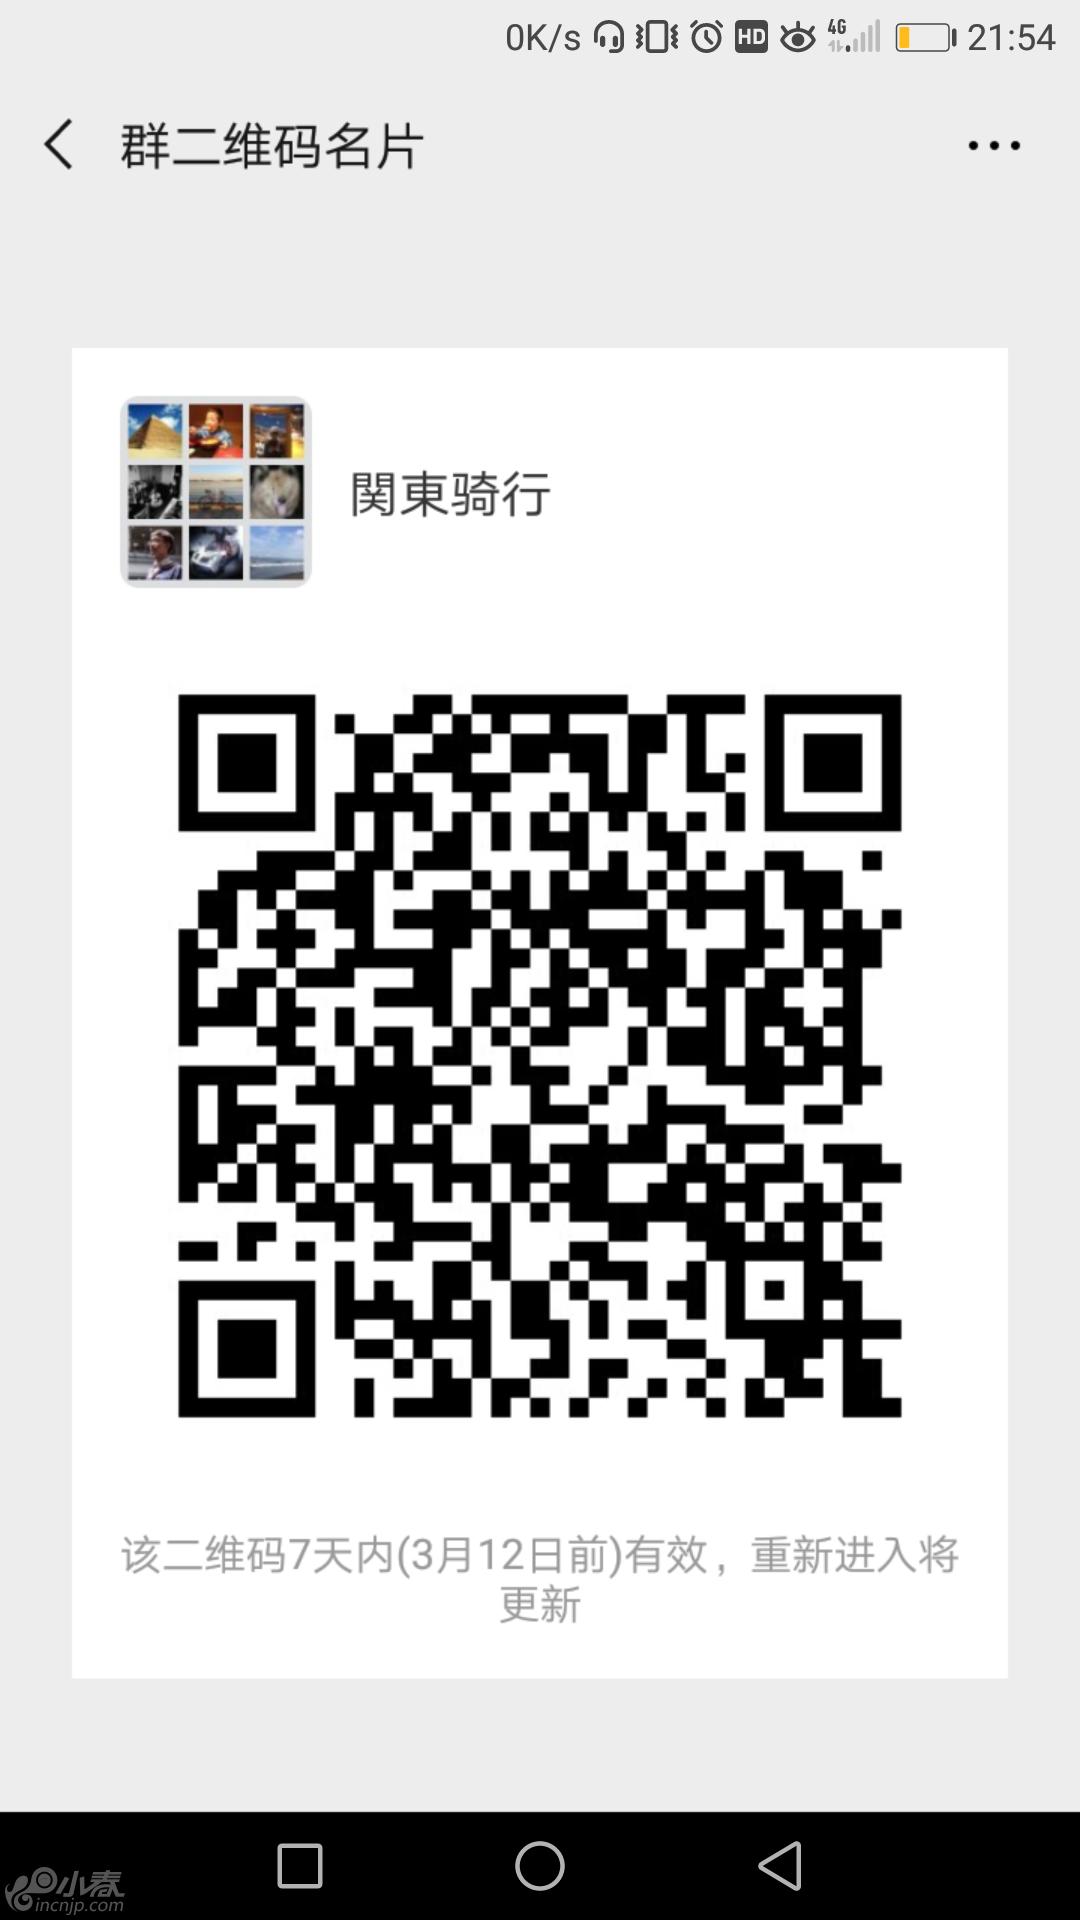 Screenshot_20190305-215410.png